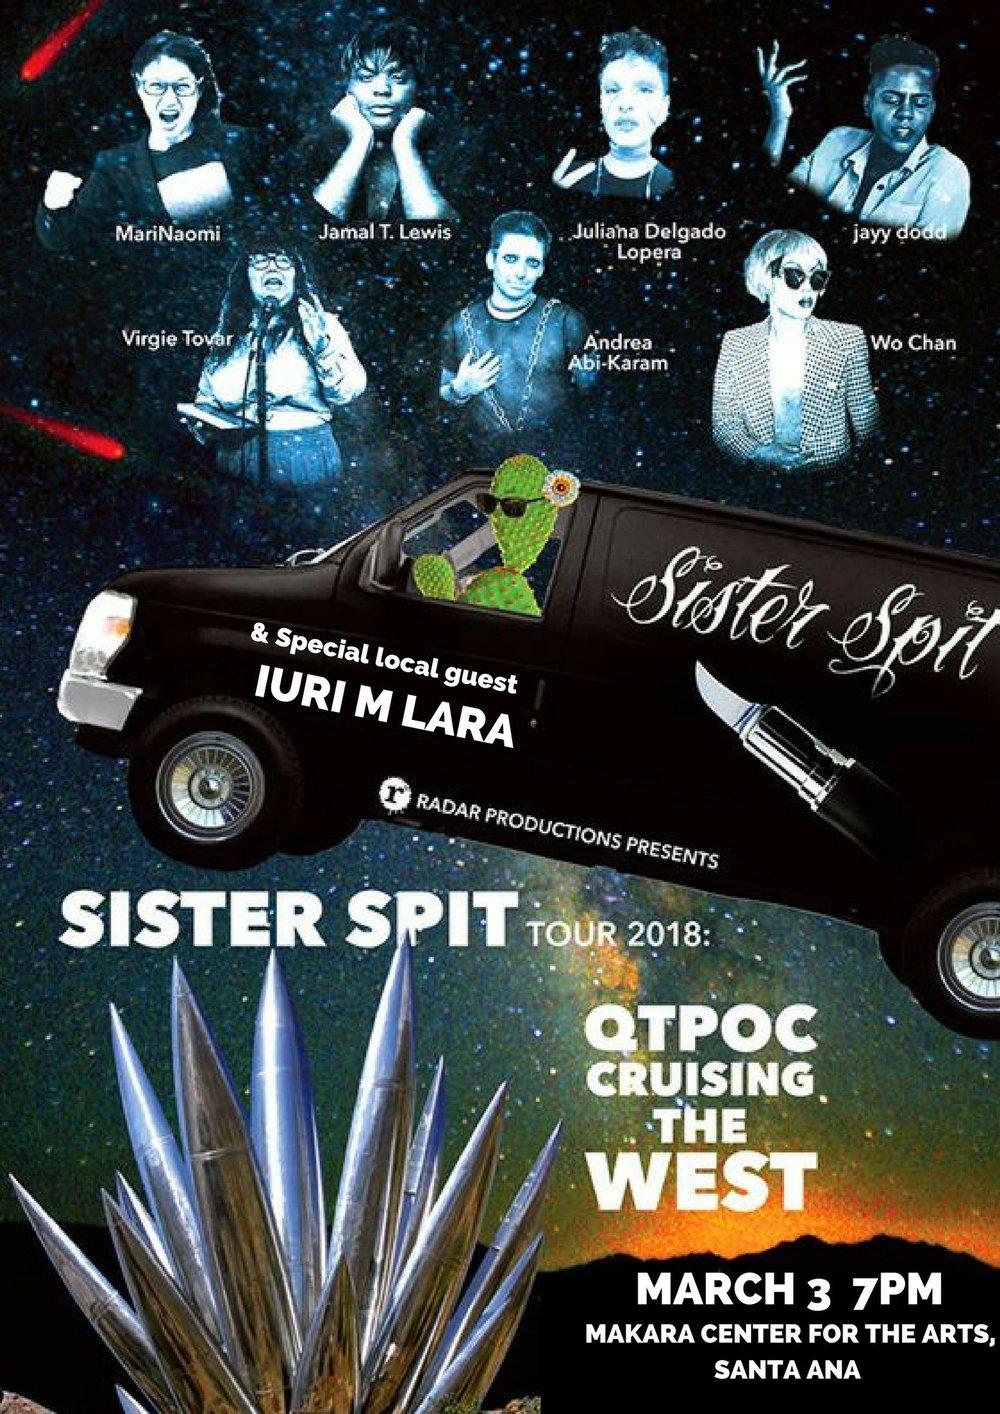 SisterSpit_SantaAna_Makara.jpg